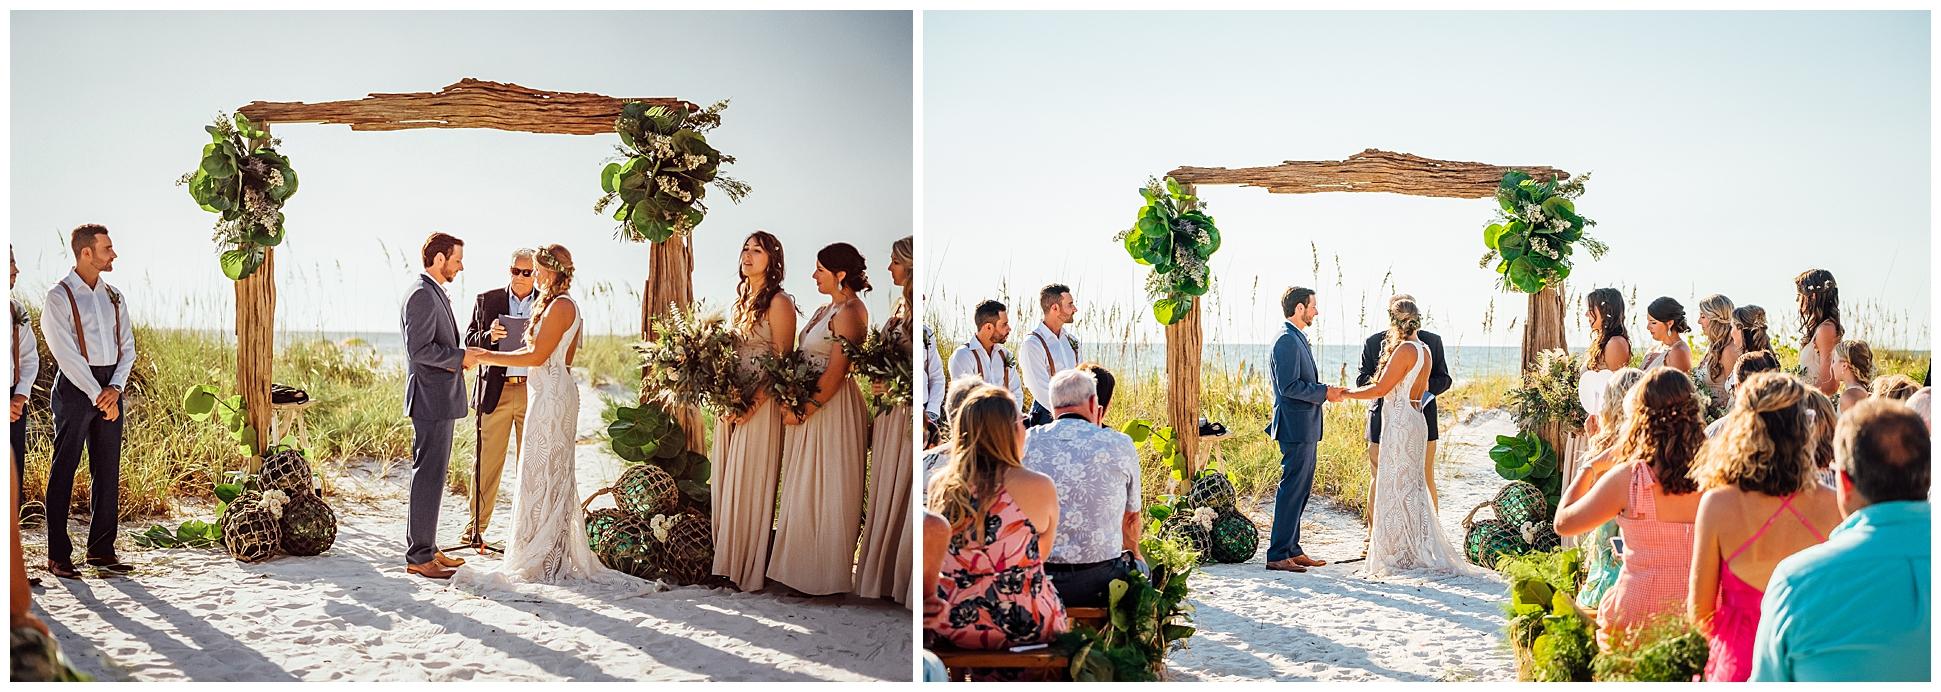 medium-format-film-vs-digital-wedding-photography-florida-beach_0012.jpg